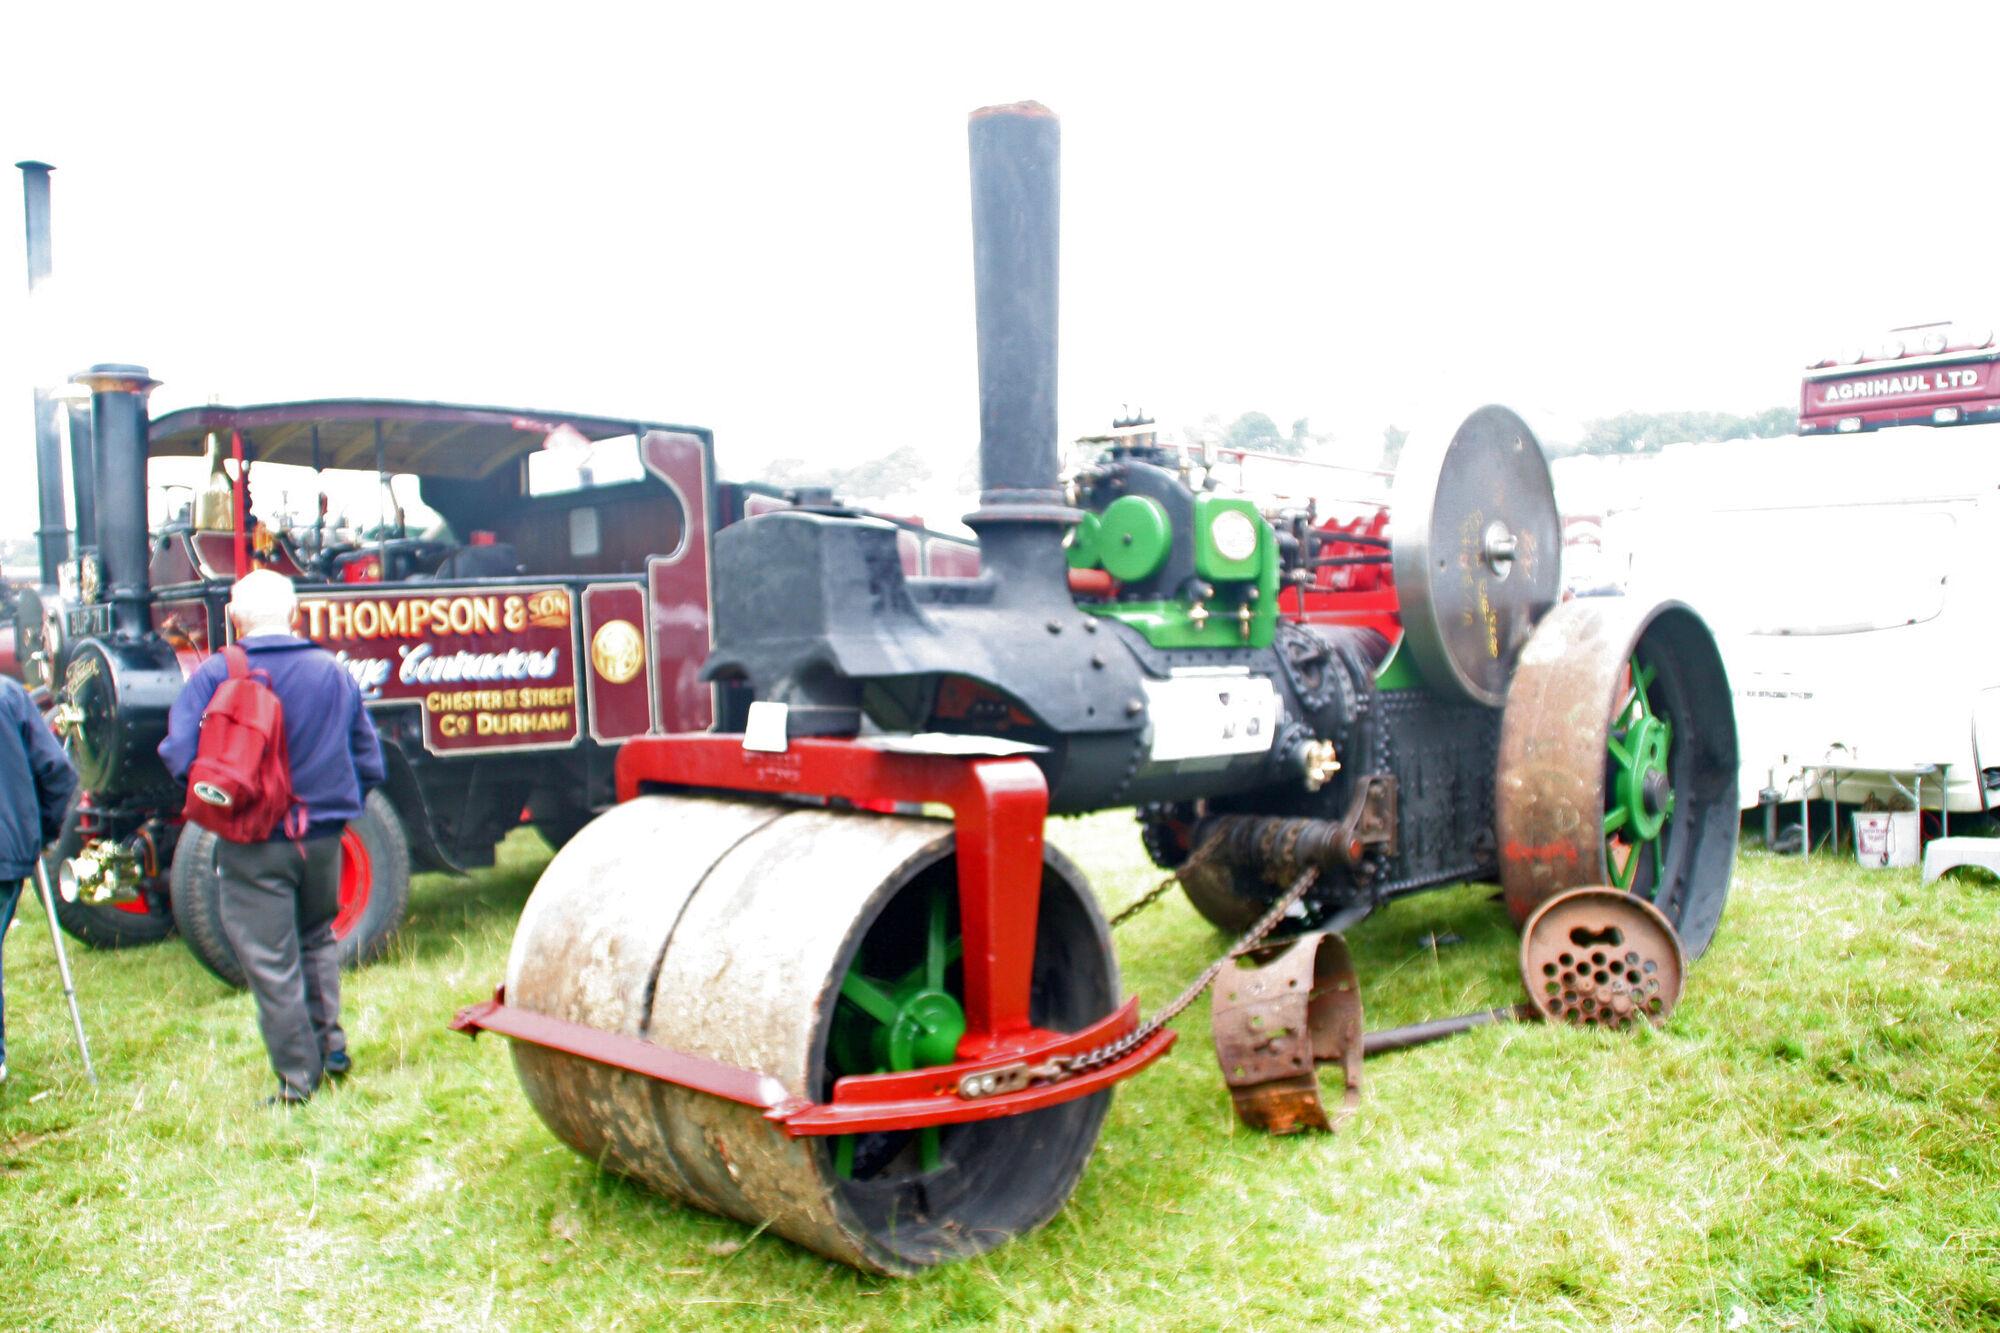 Aveling porter no 9303 tractor construction plant wiki fandom powered by wikia - Porter international wiki ...